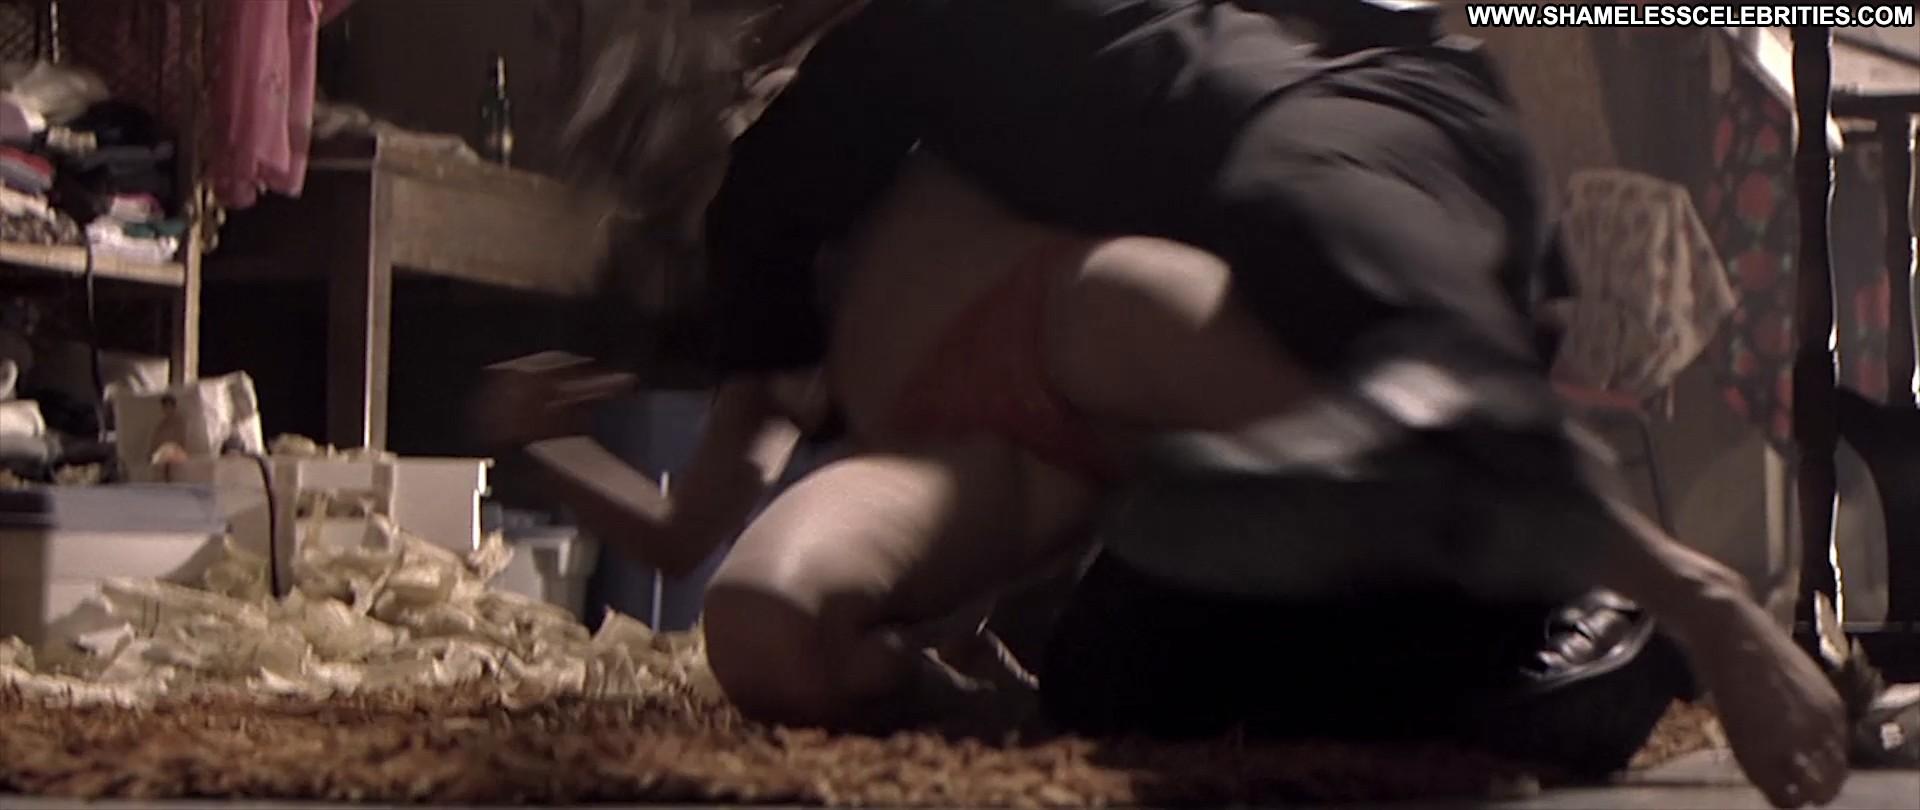 Hot scene from movie 2